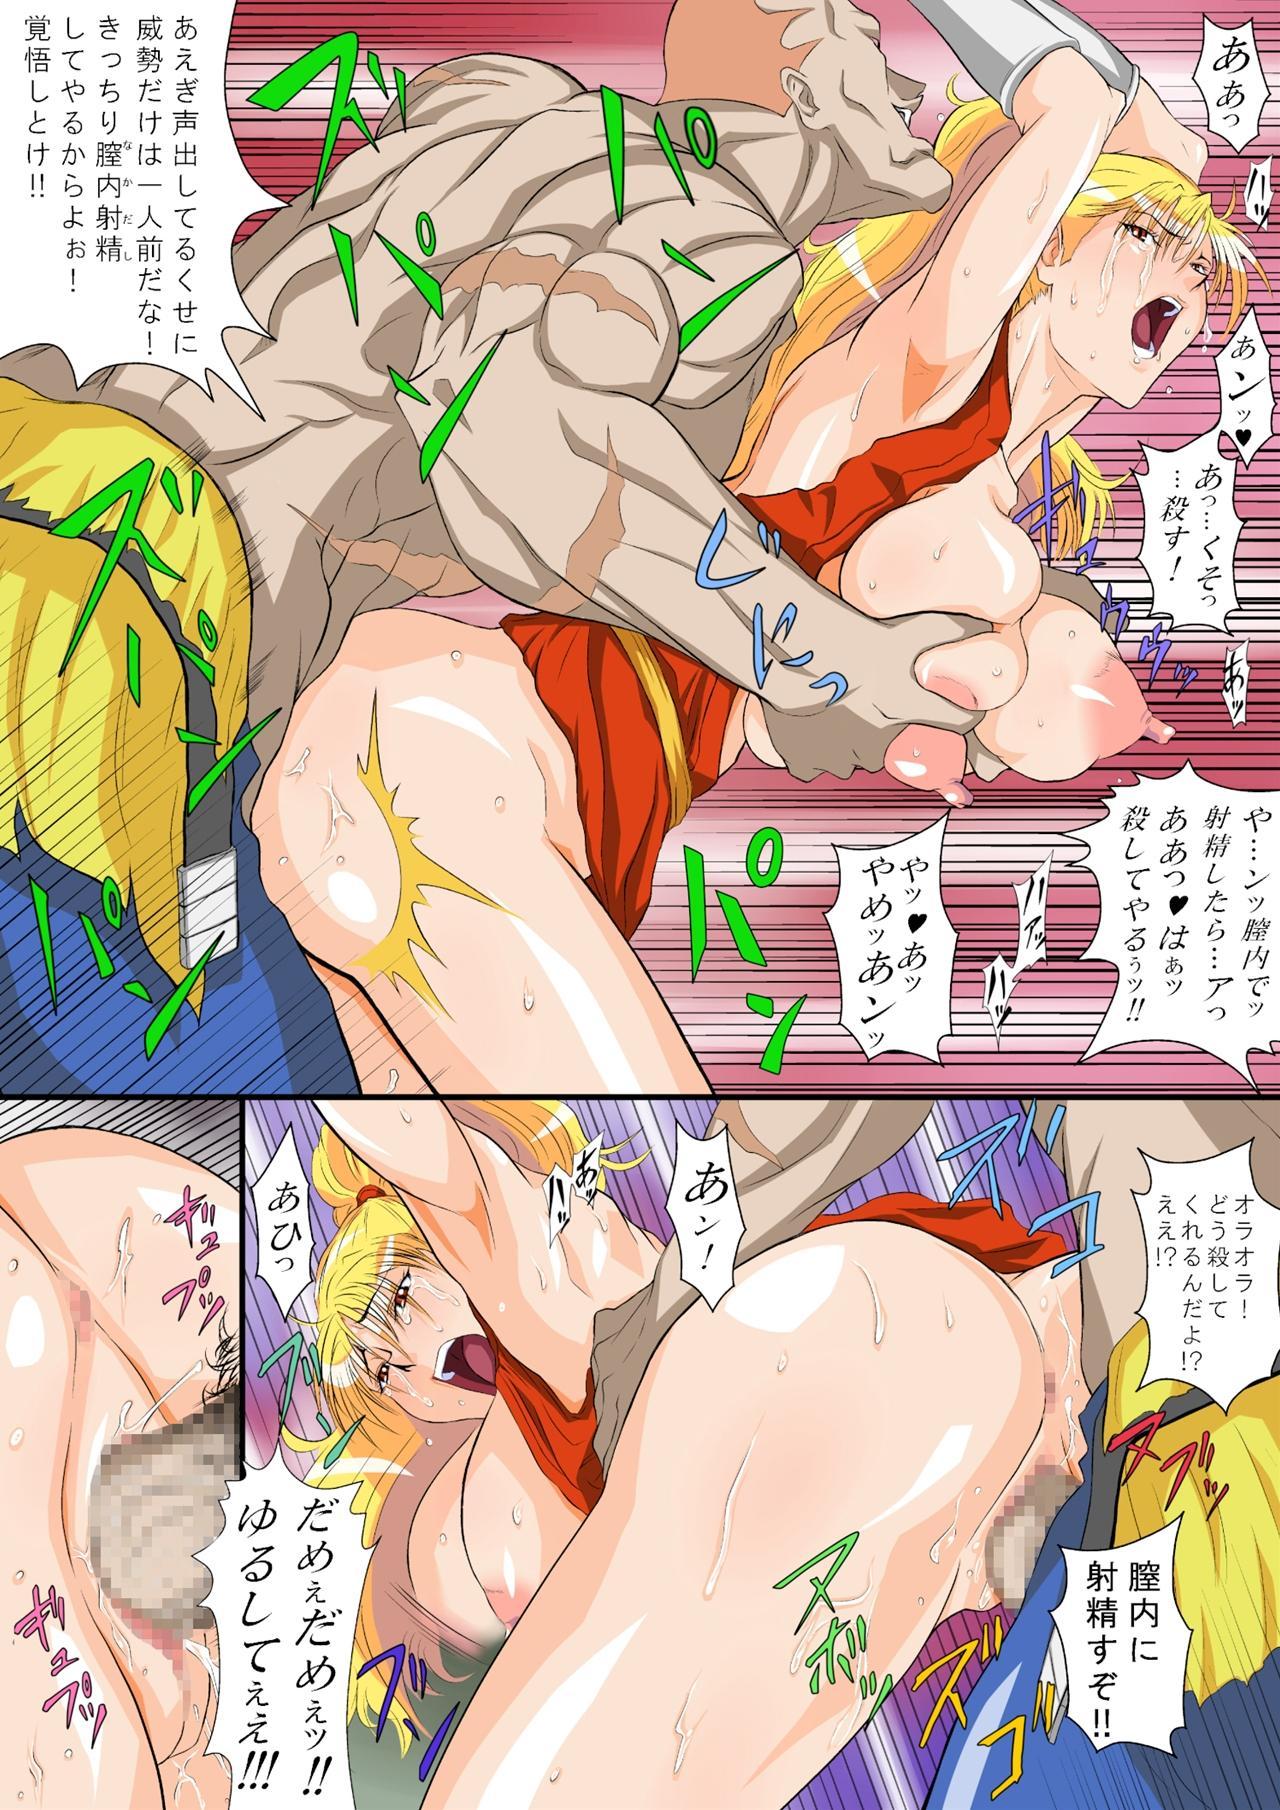 Maki's Stage 4 32